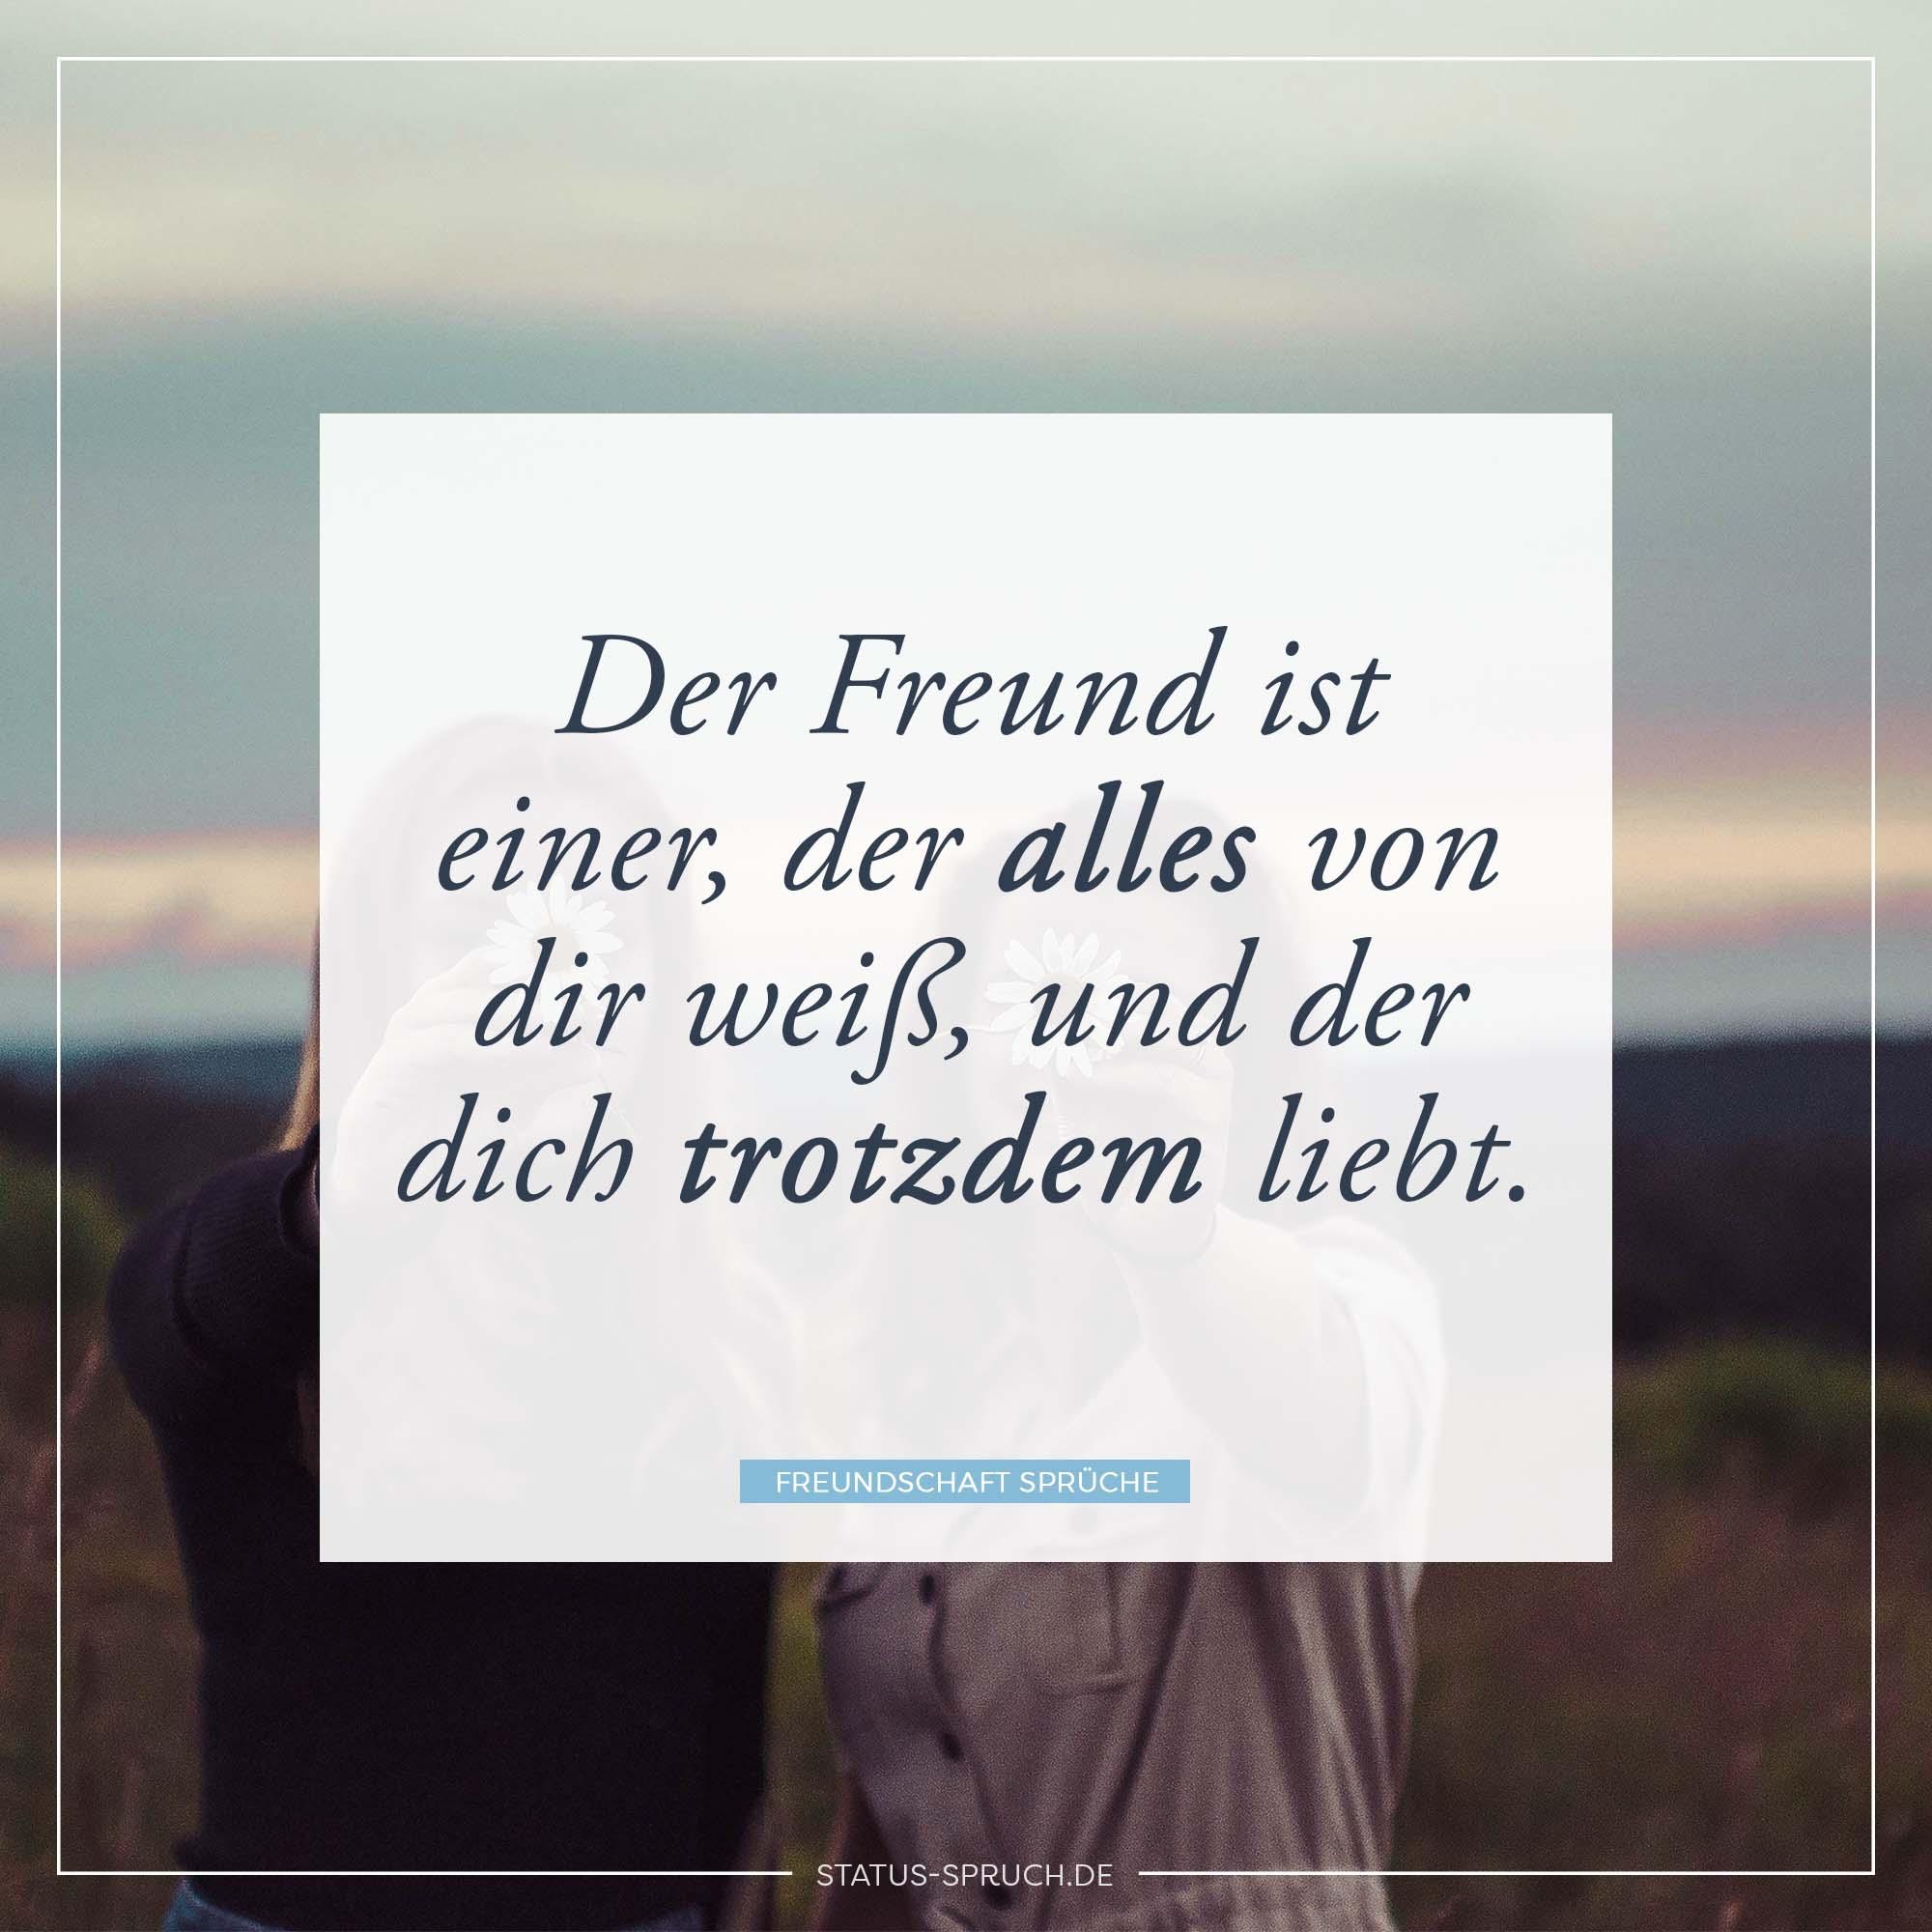 Spruch des Tages Freundschaft